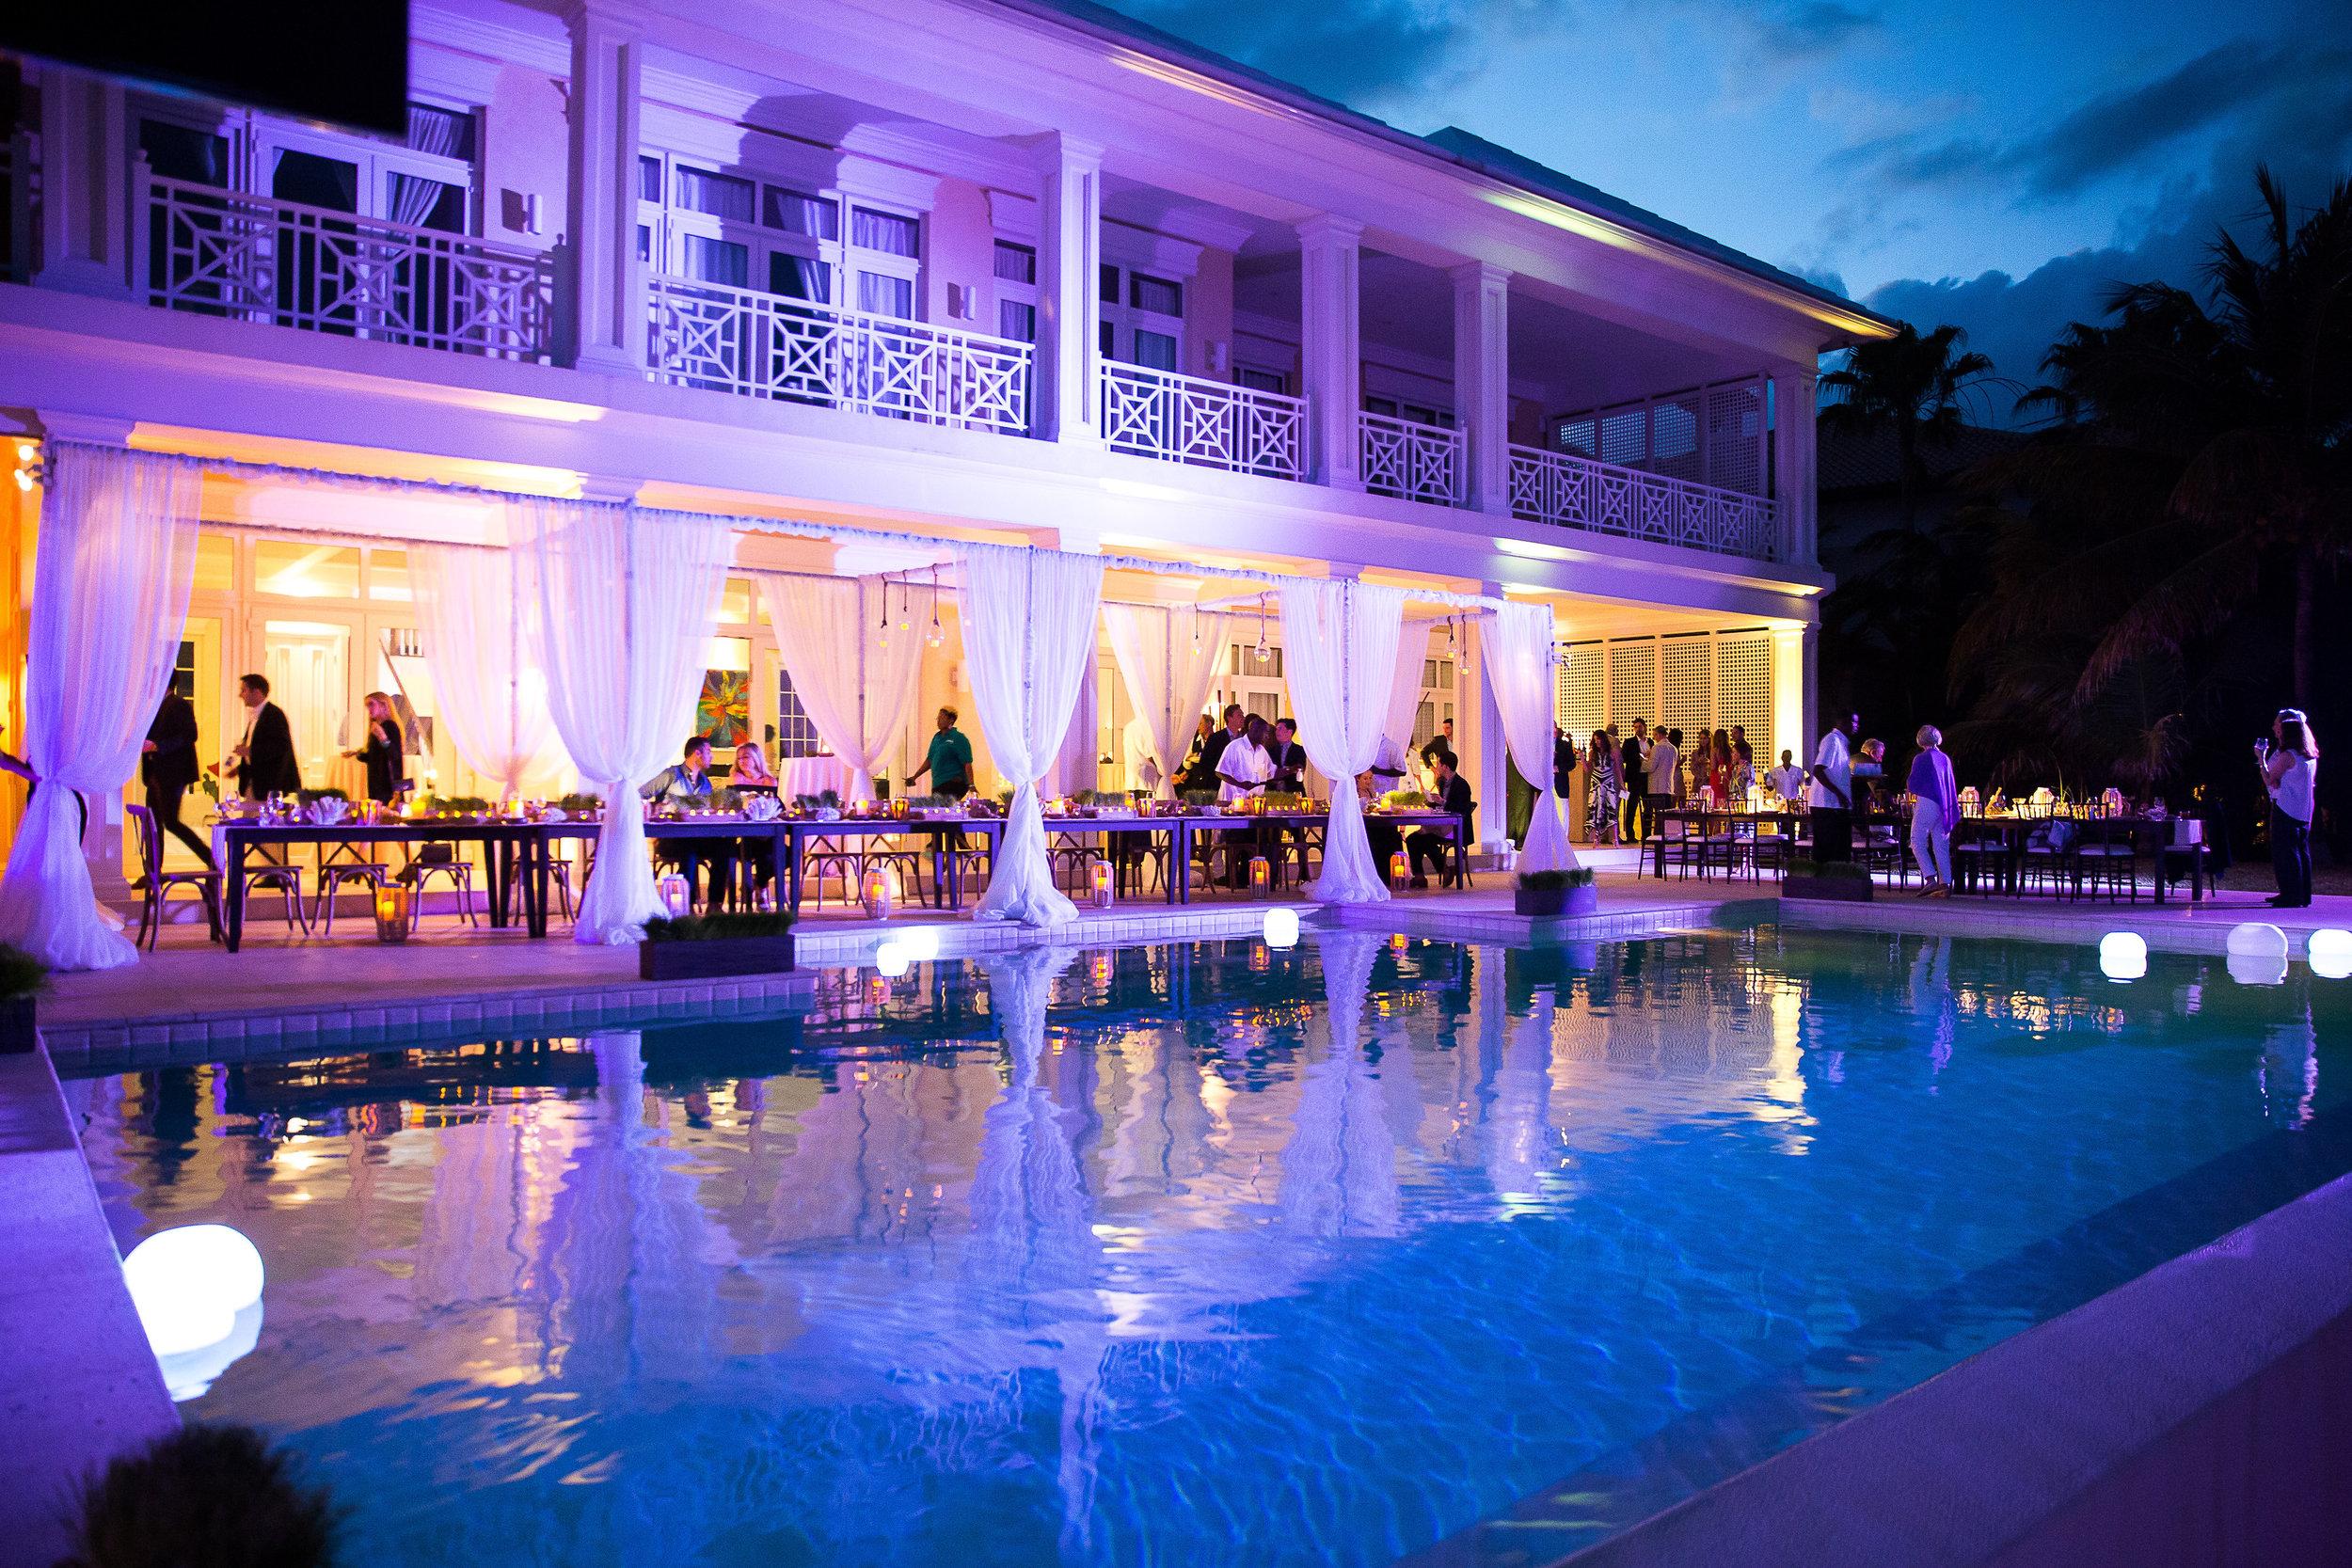 Ceci_New_York_Ceci_Style_Ceci_Johnson_Luxury_Lifestyle_Destination_Bahamas_Wedding_Letterpress_Inspiration_Design_Custom_Couture_Personalized_Invitations_19.jpg